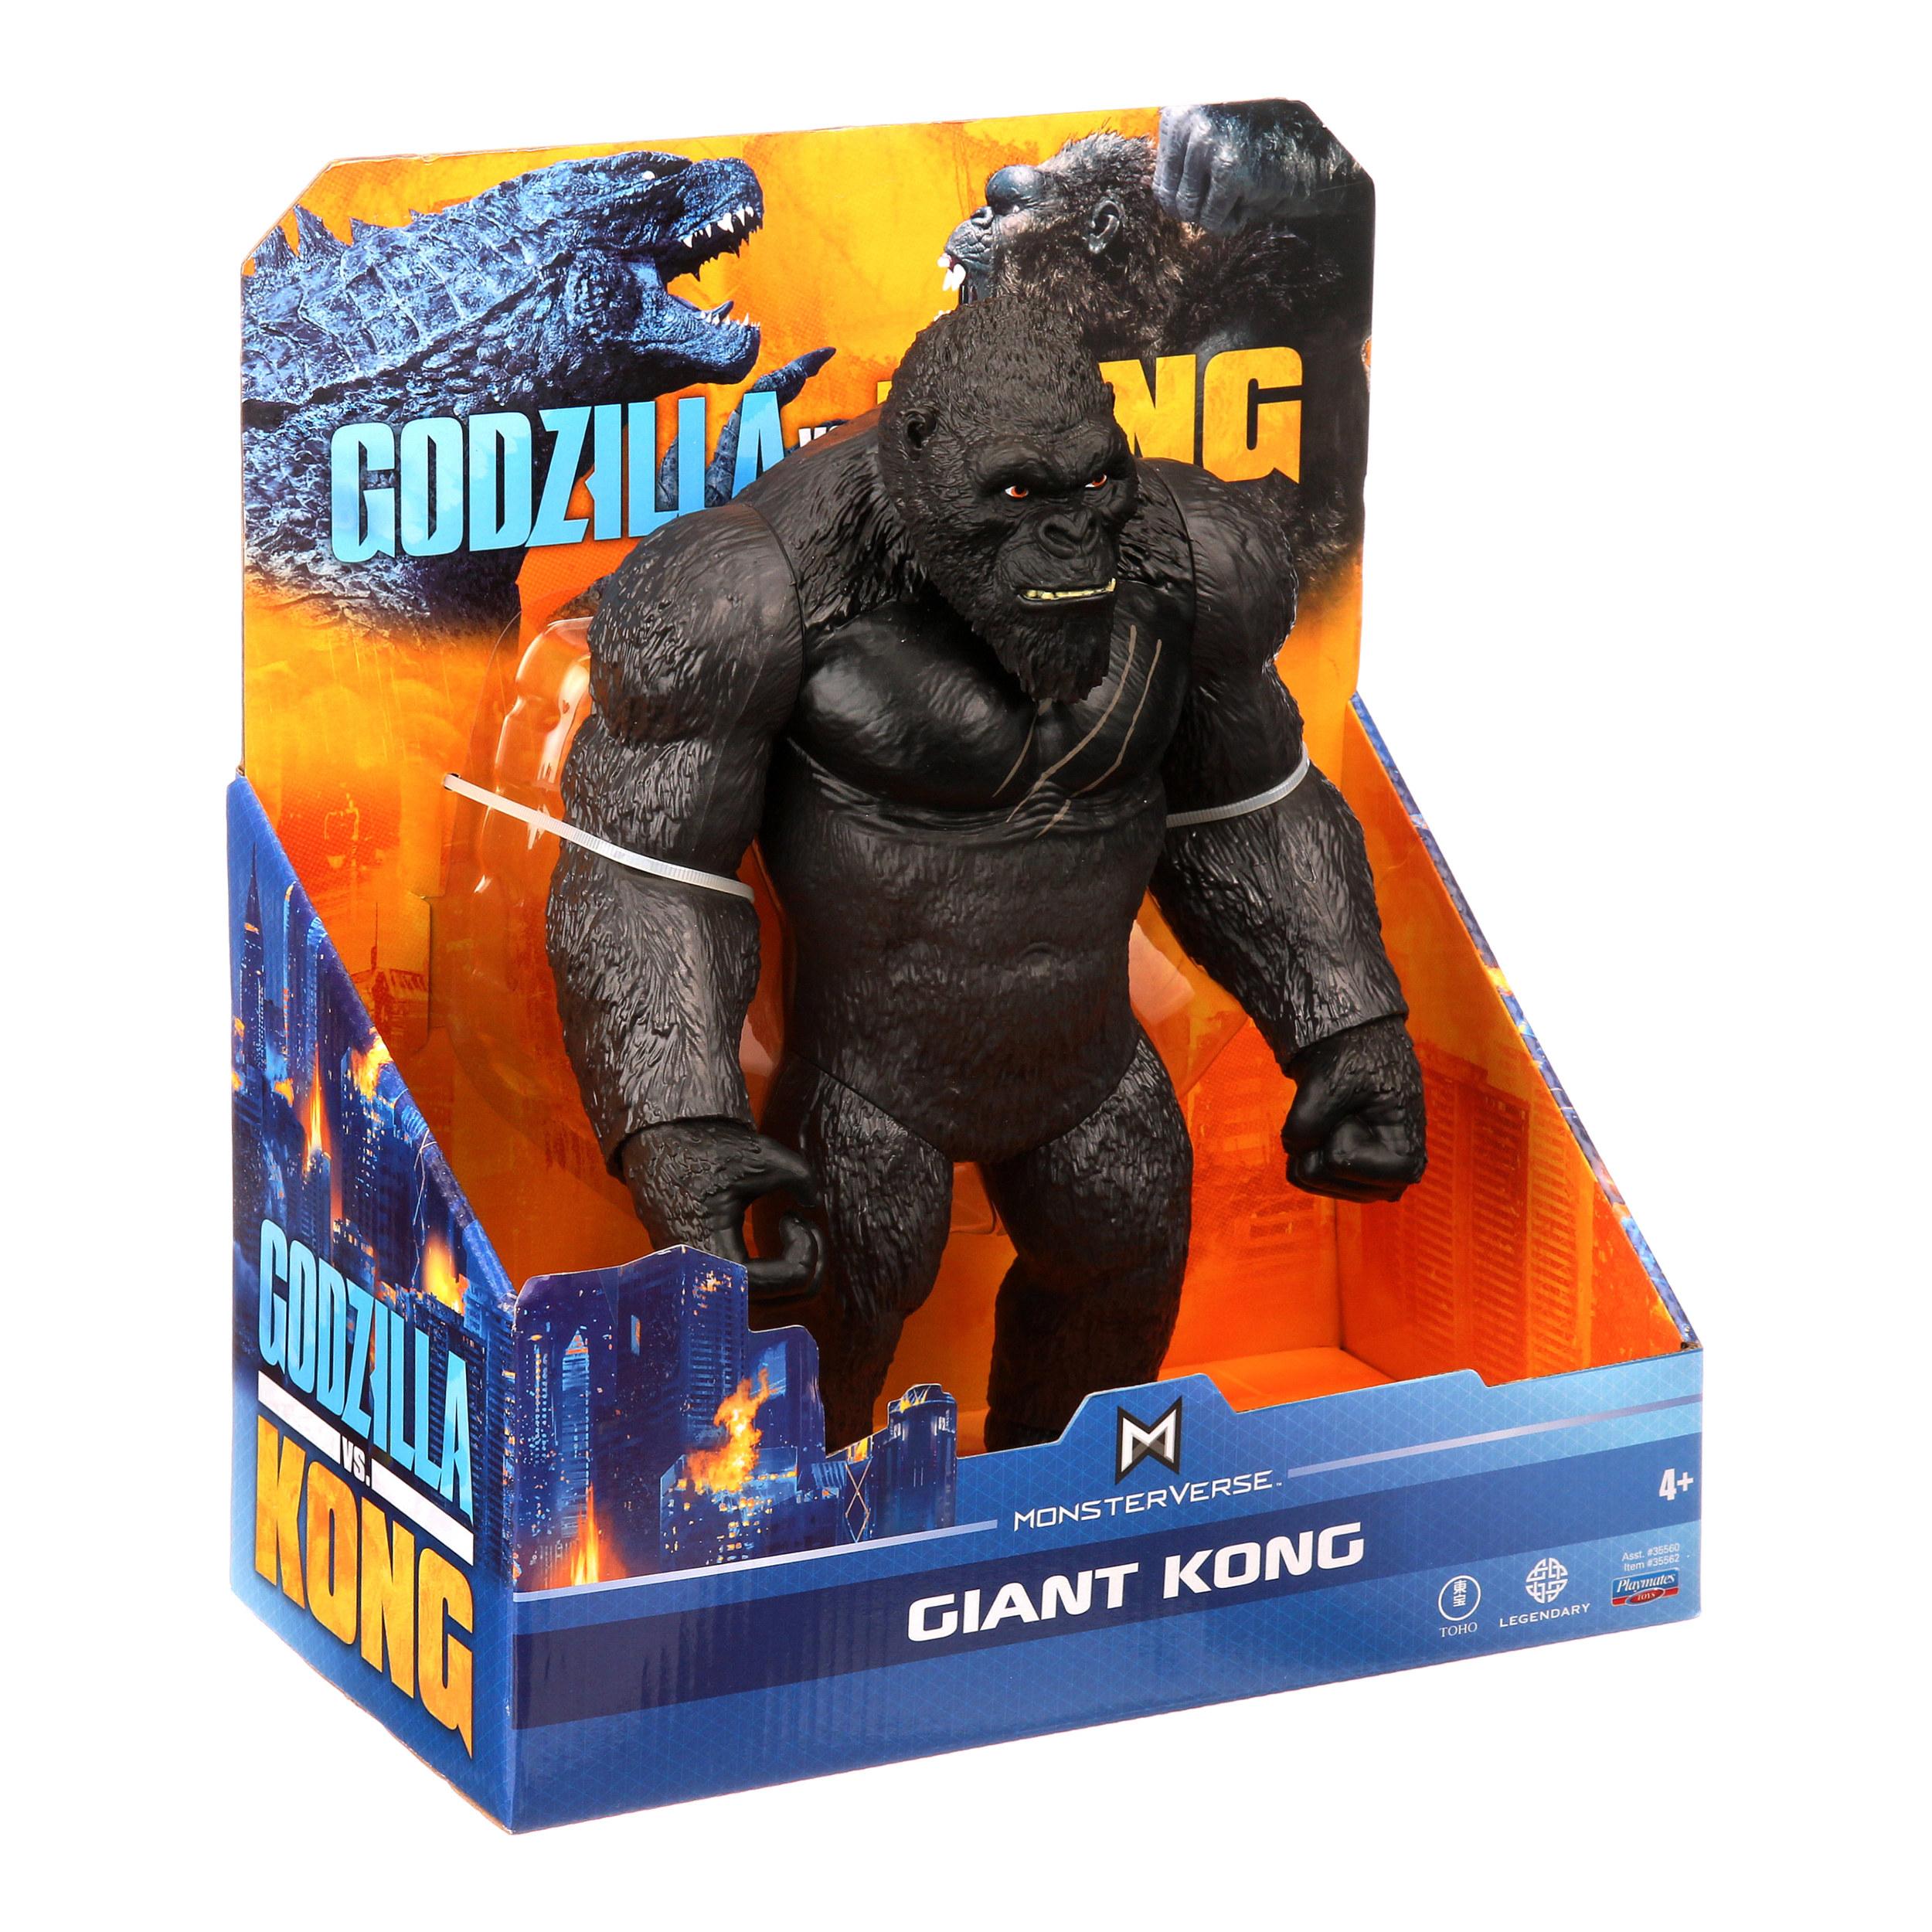 A King Kong figure